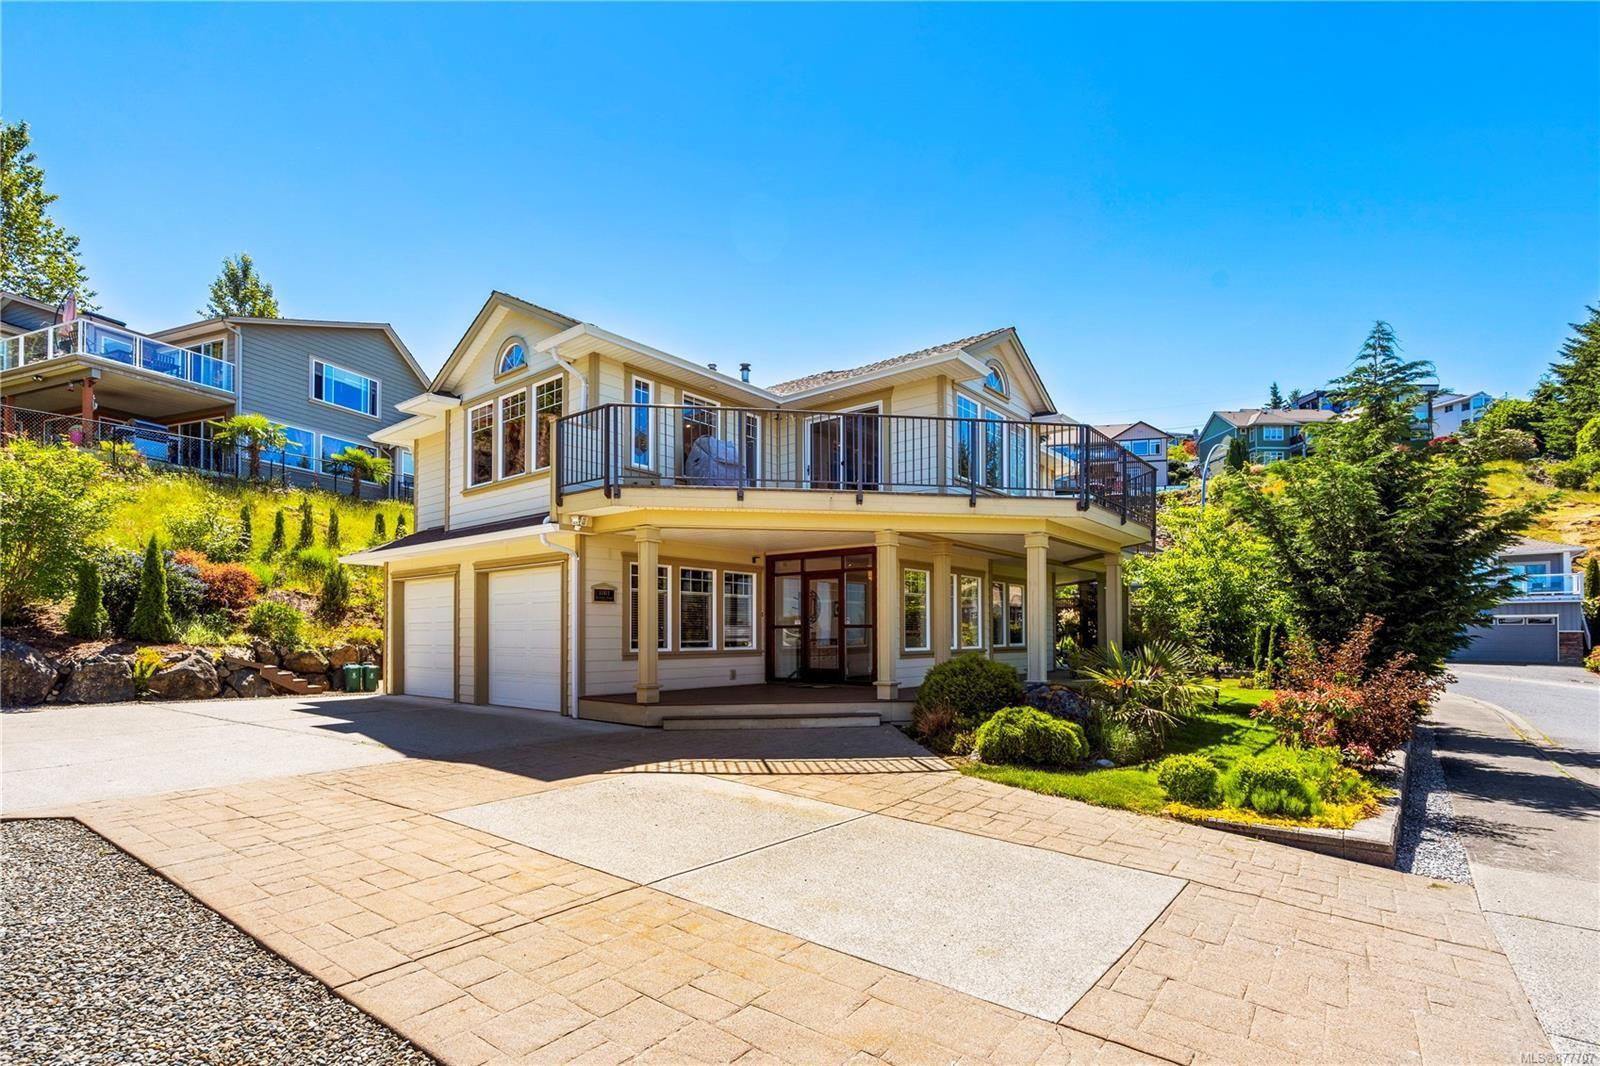 Main Photo: 1001 Roxboro Pl in : Na University District House for sale (Nanaimo)  : MLS®# 877707